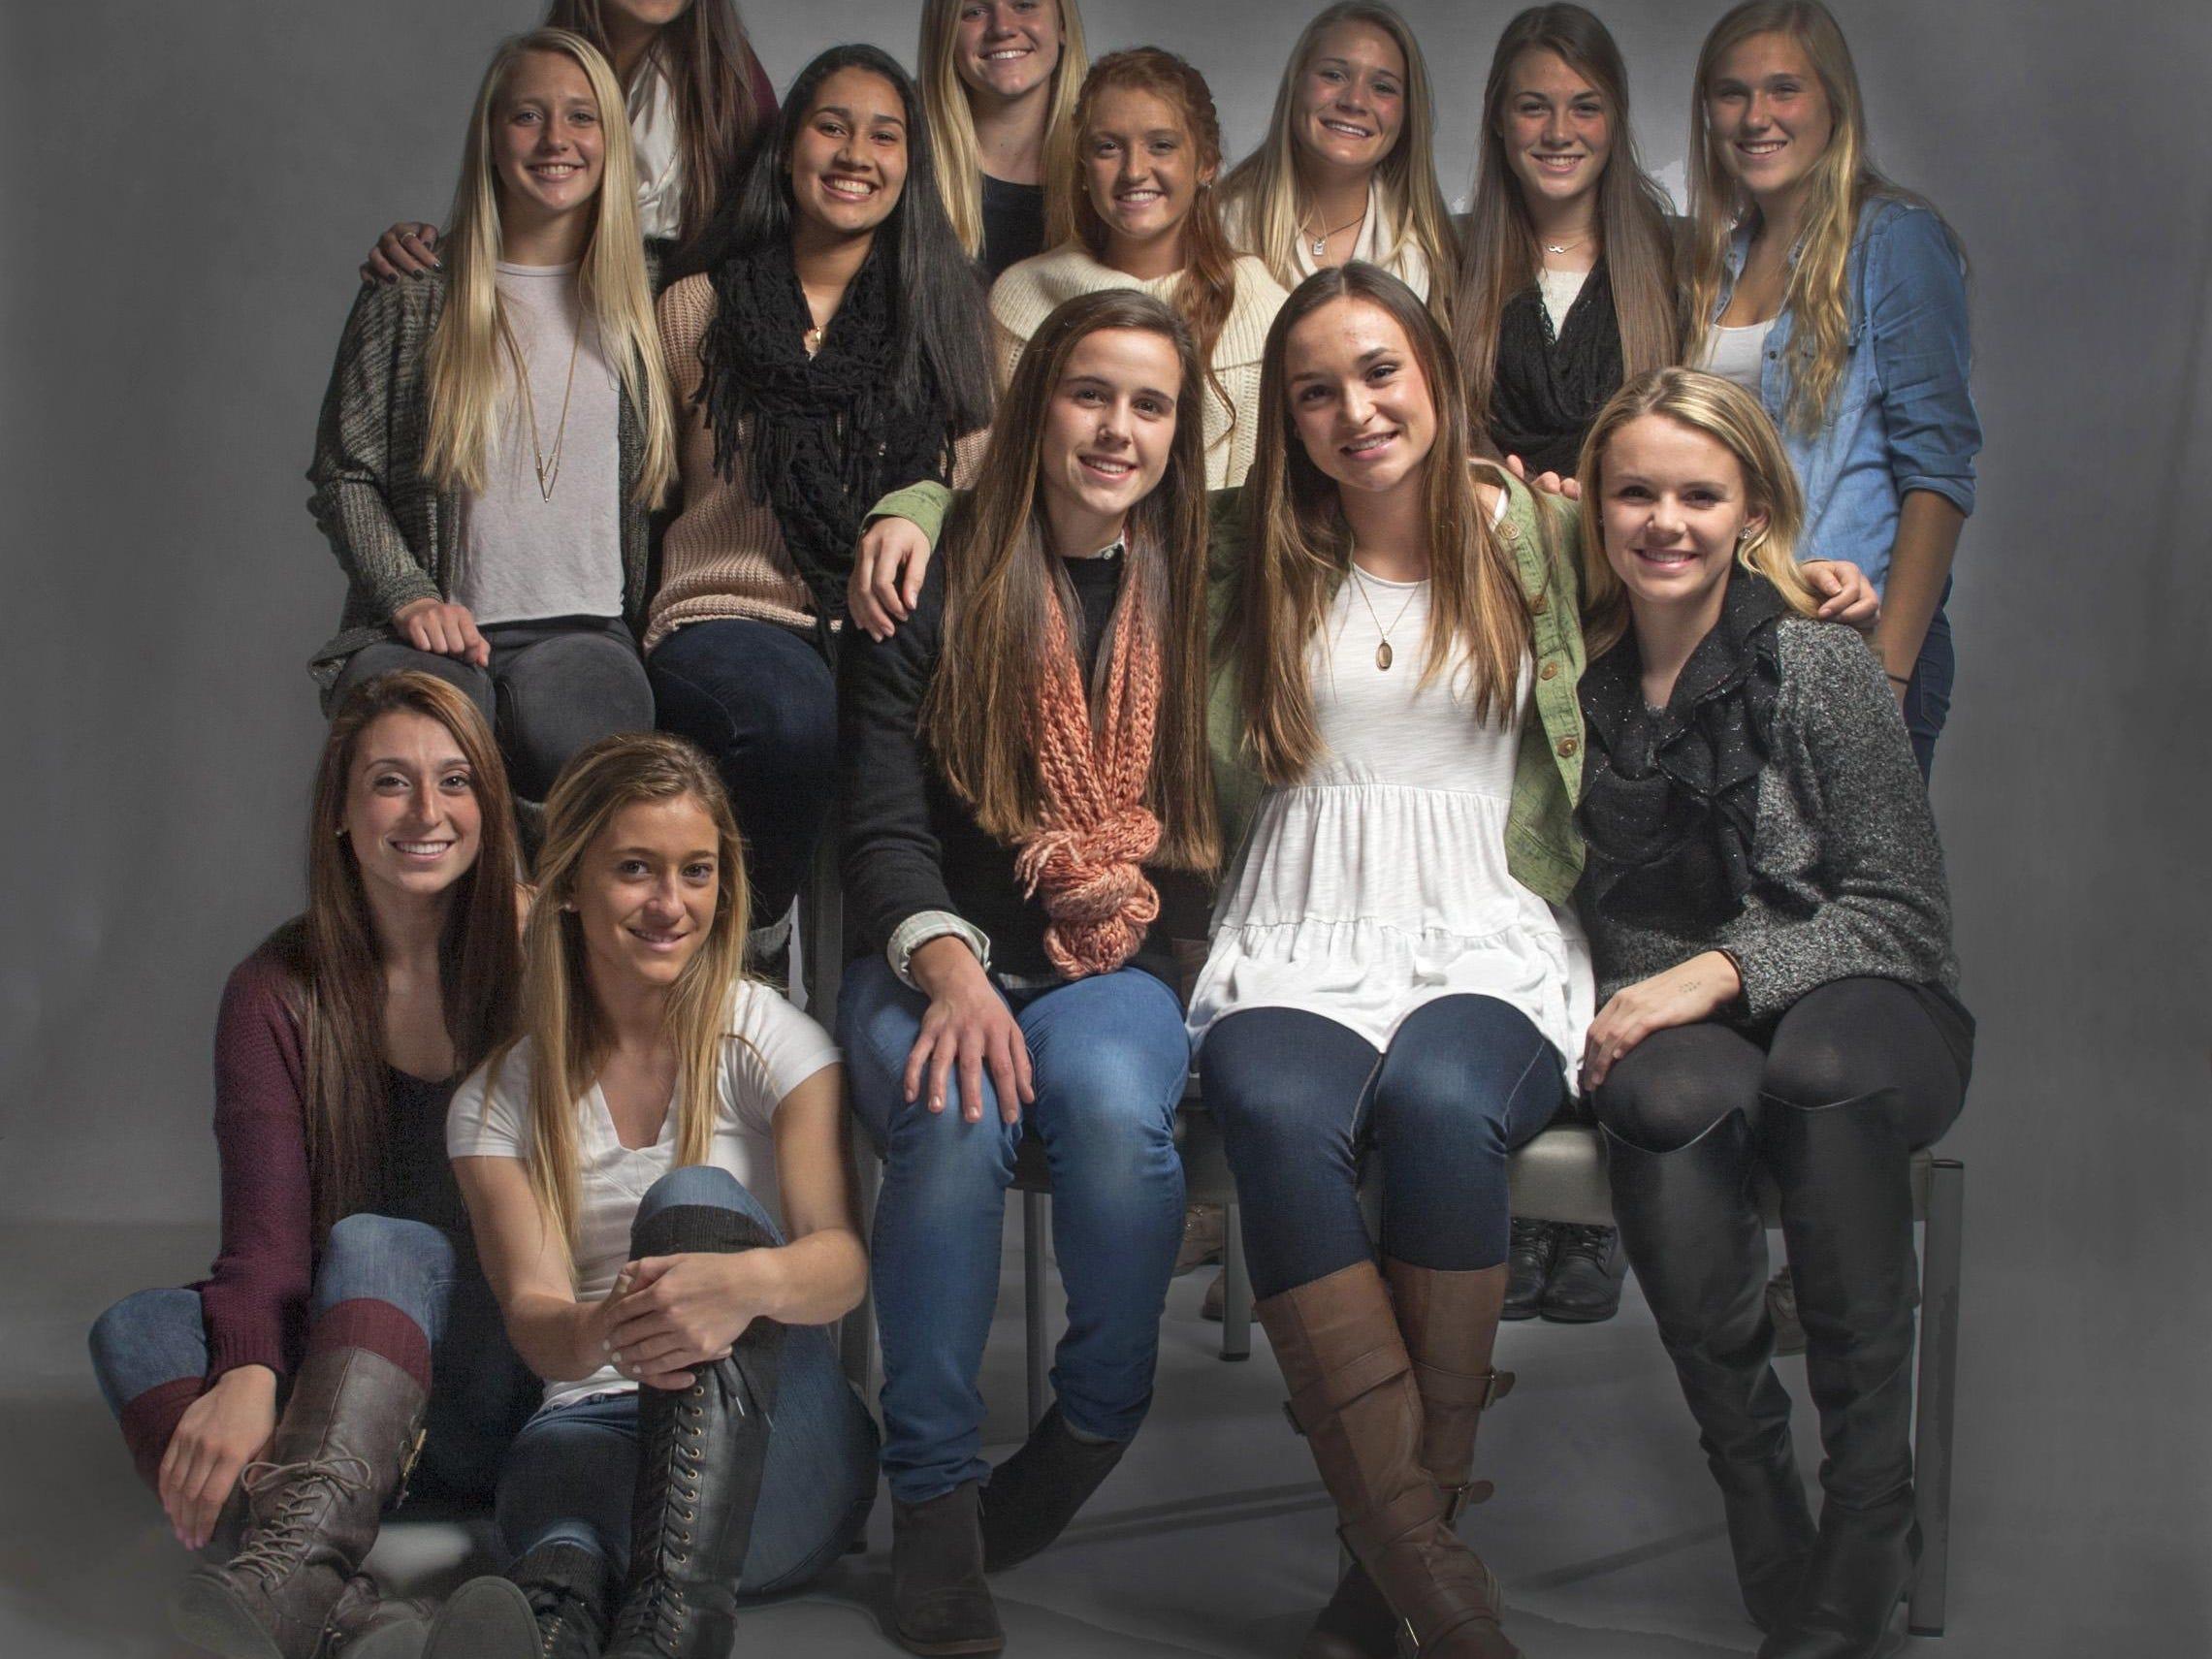 The 2014 Asbury Park Press All-Shore Girls Soccer Team.